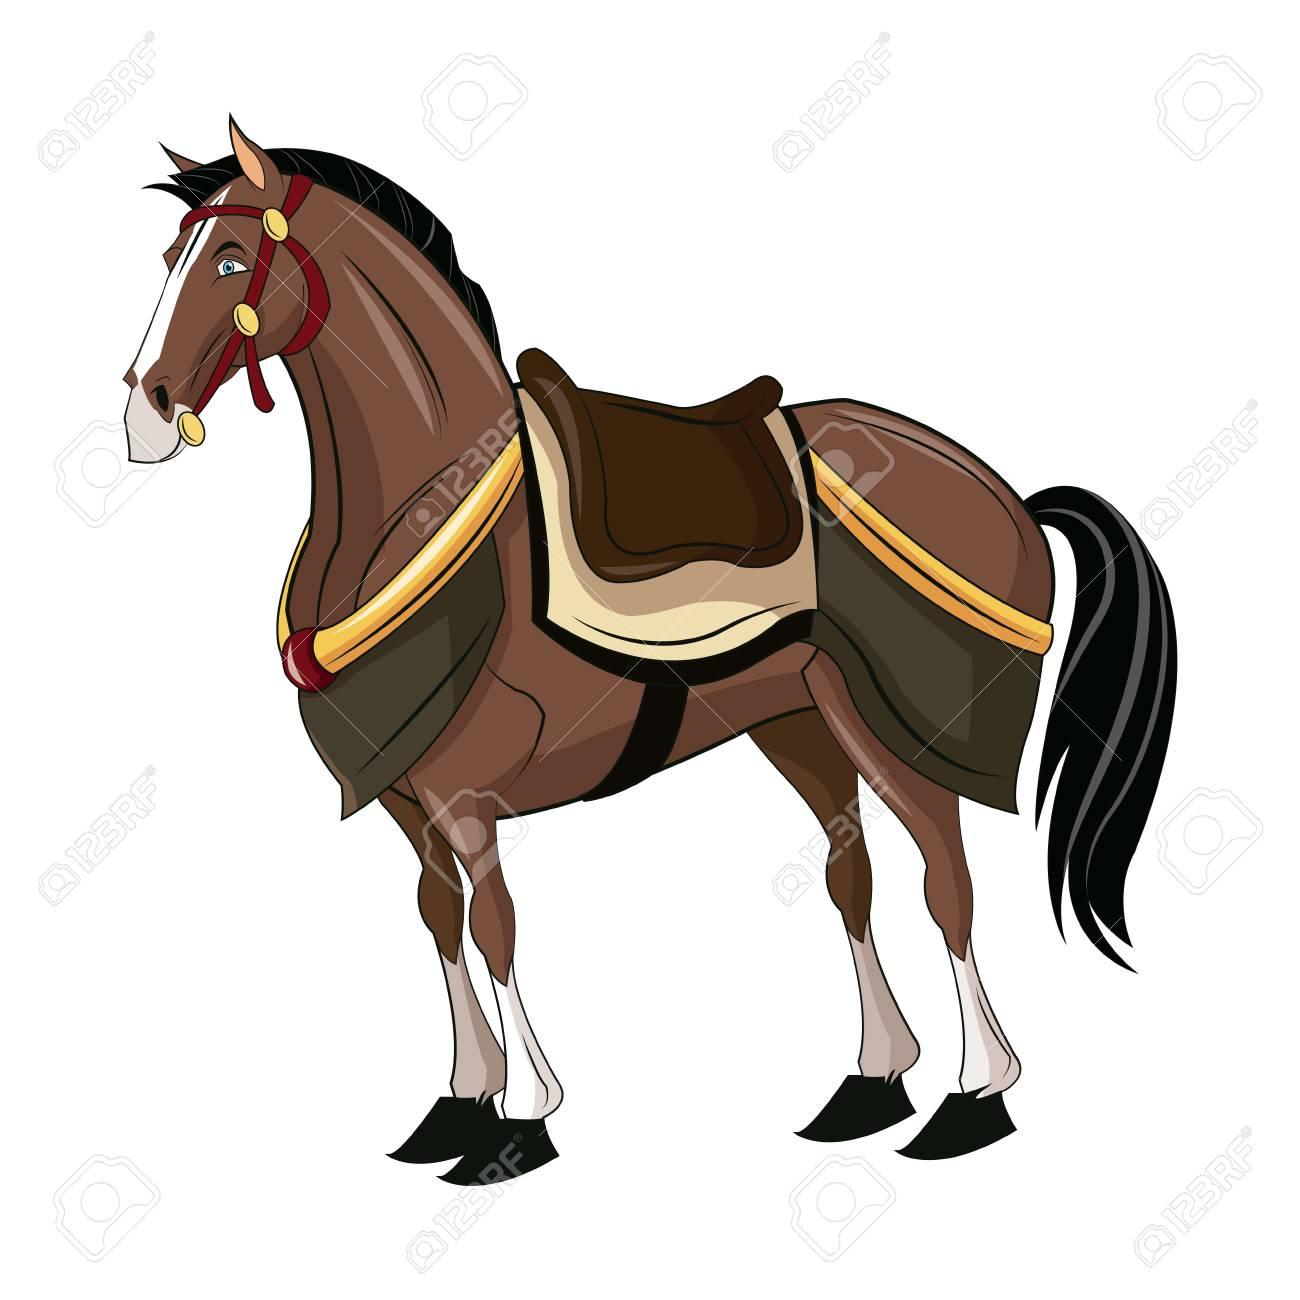 Horse Of Samurai Animal Warhorse Oriental Vector Illustration Royalty Free Cliparts Vectors And Stock Illustration Image 78861107